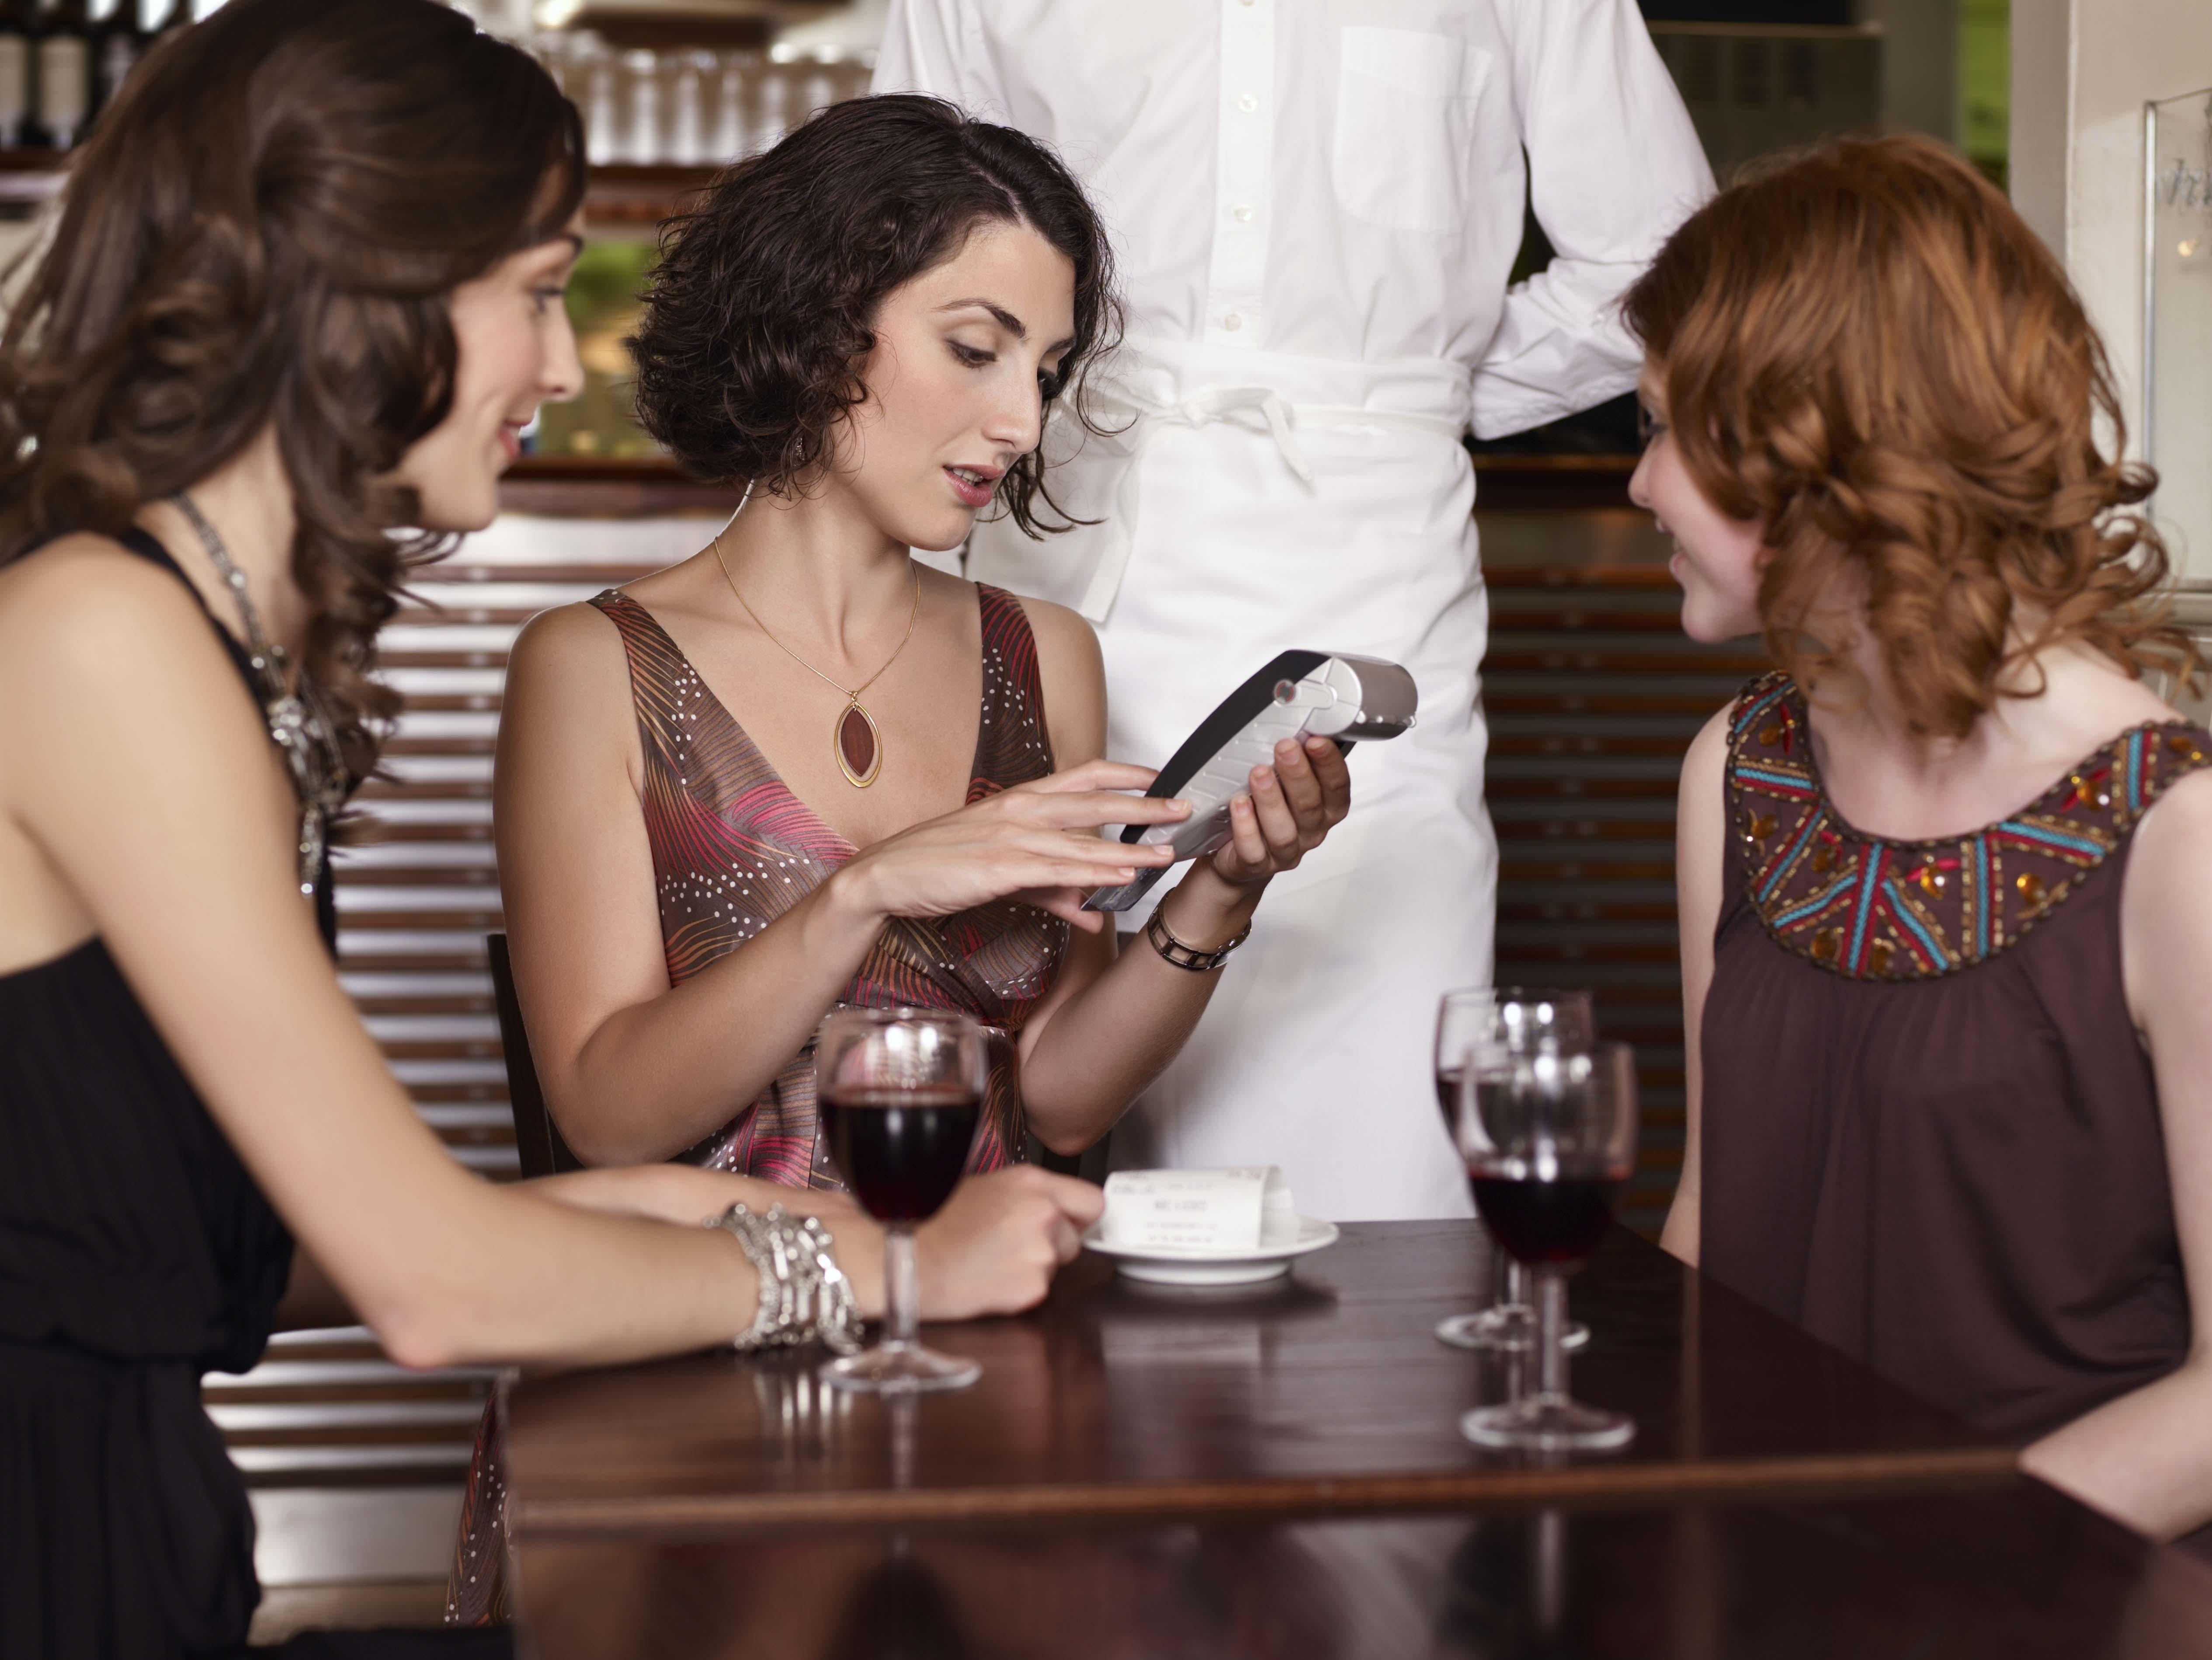 restaurant check group